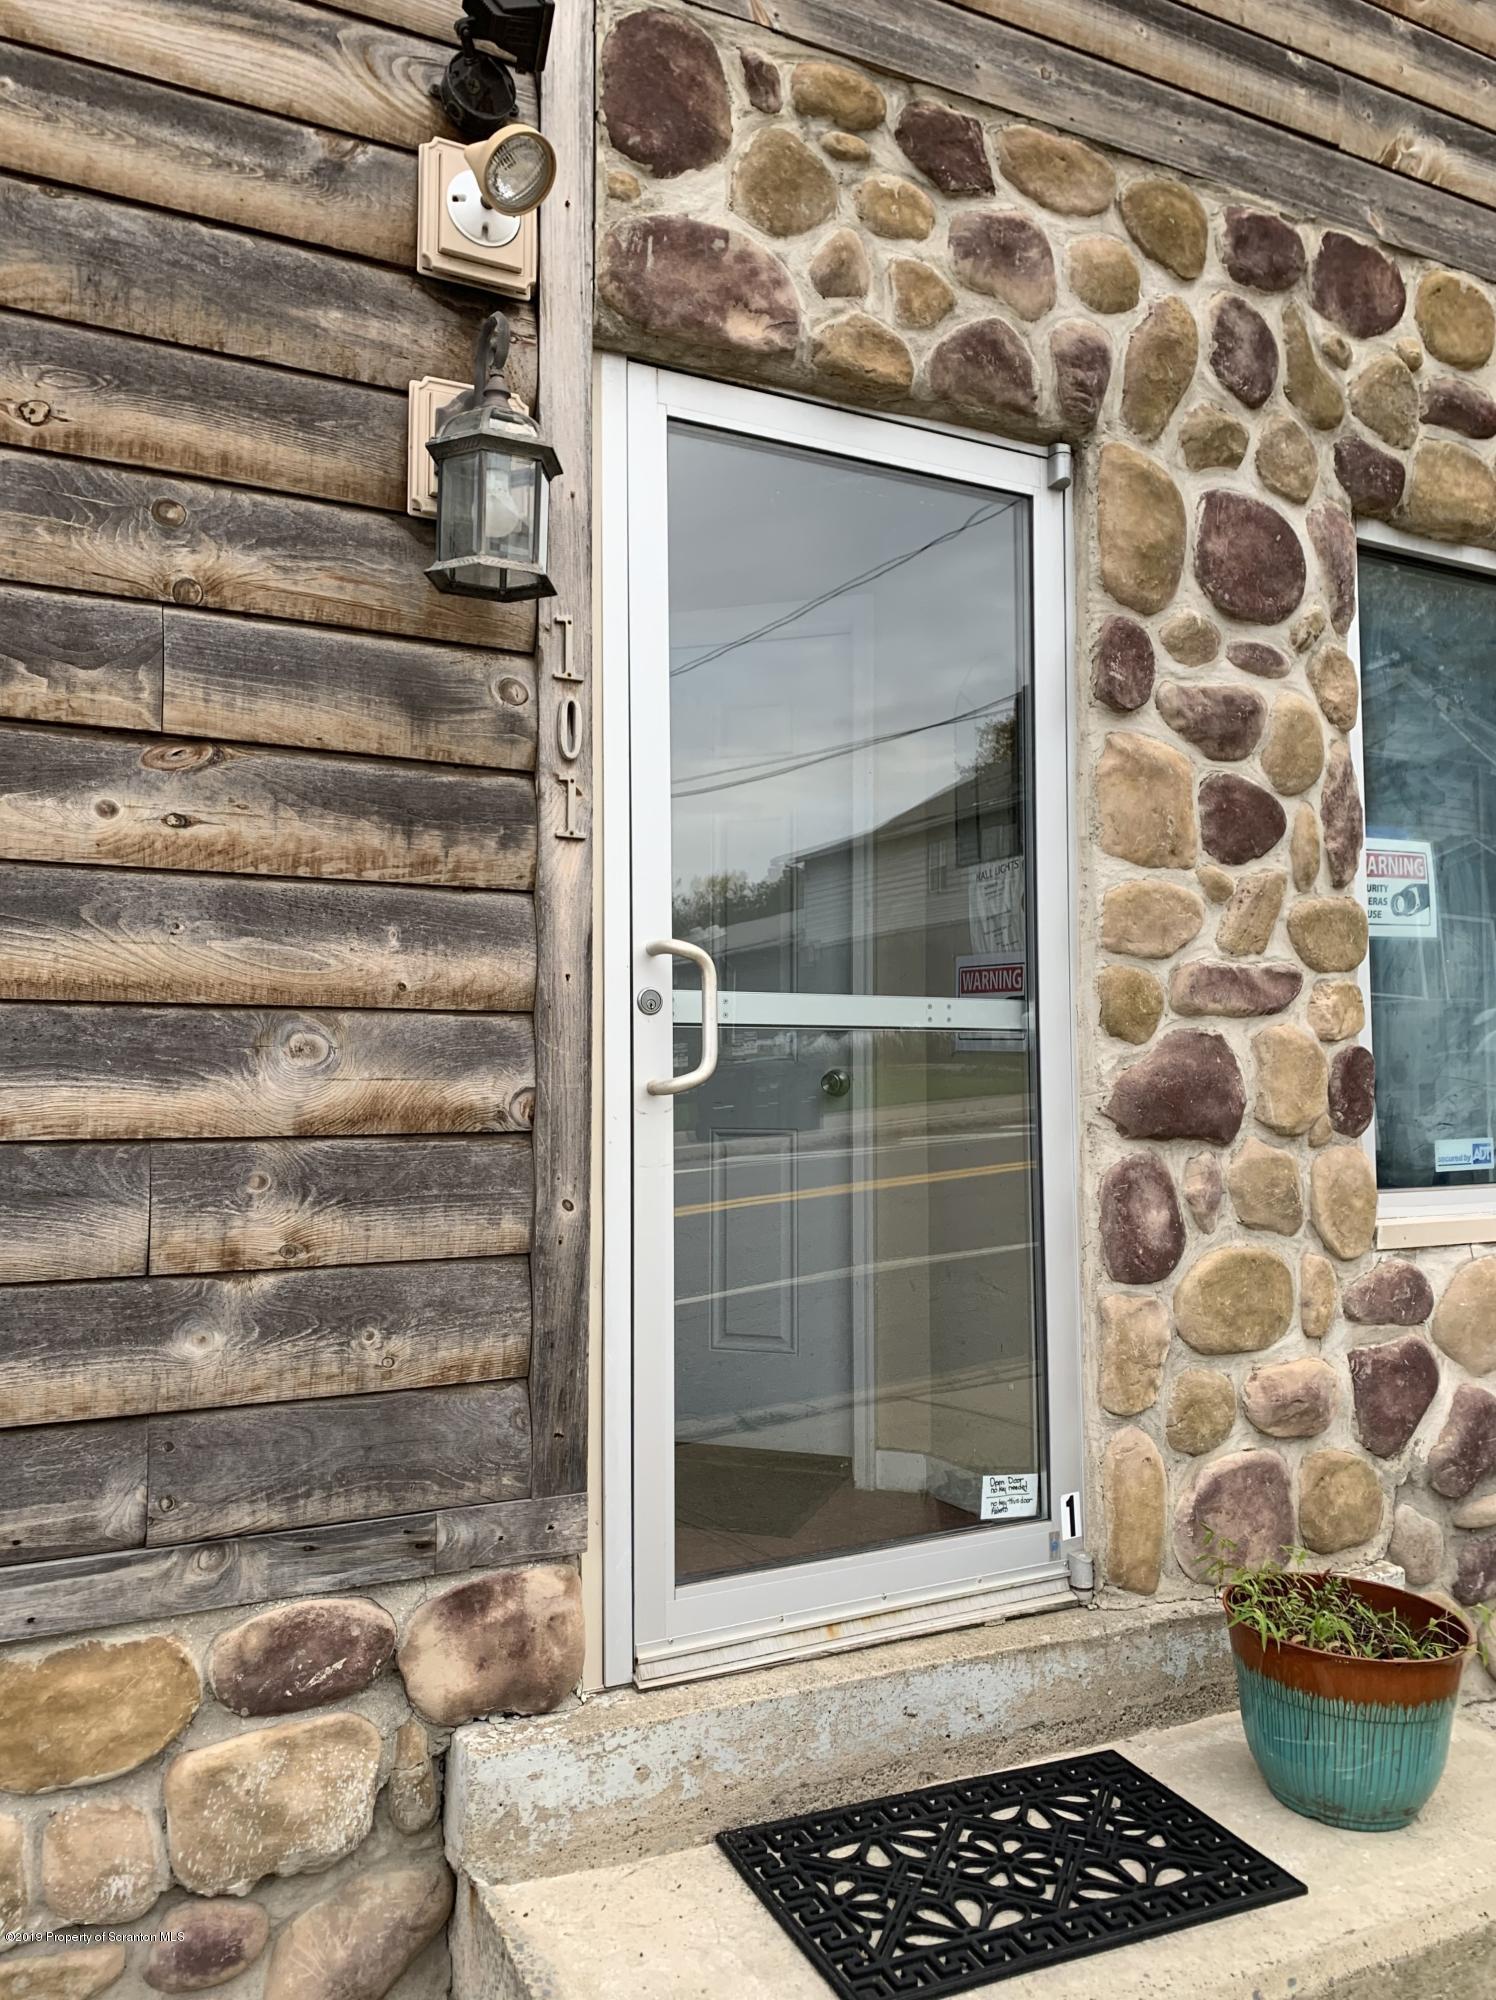 101 Church St - Unit 4, Moscow, Pennsylvania 18444, 1 Bedroom Bedrooms, 3 Rooms Rooms,1 BathroomBathrooms,Rental,For Lease,Church St - Unit 4,20-1137